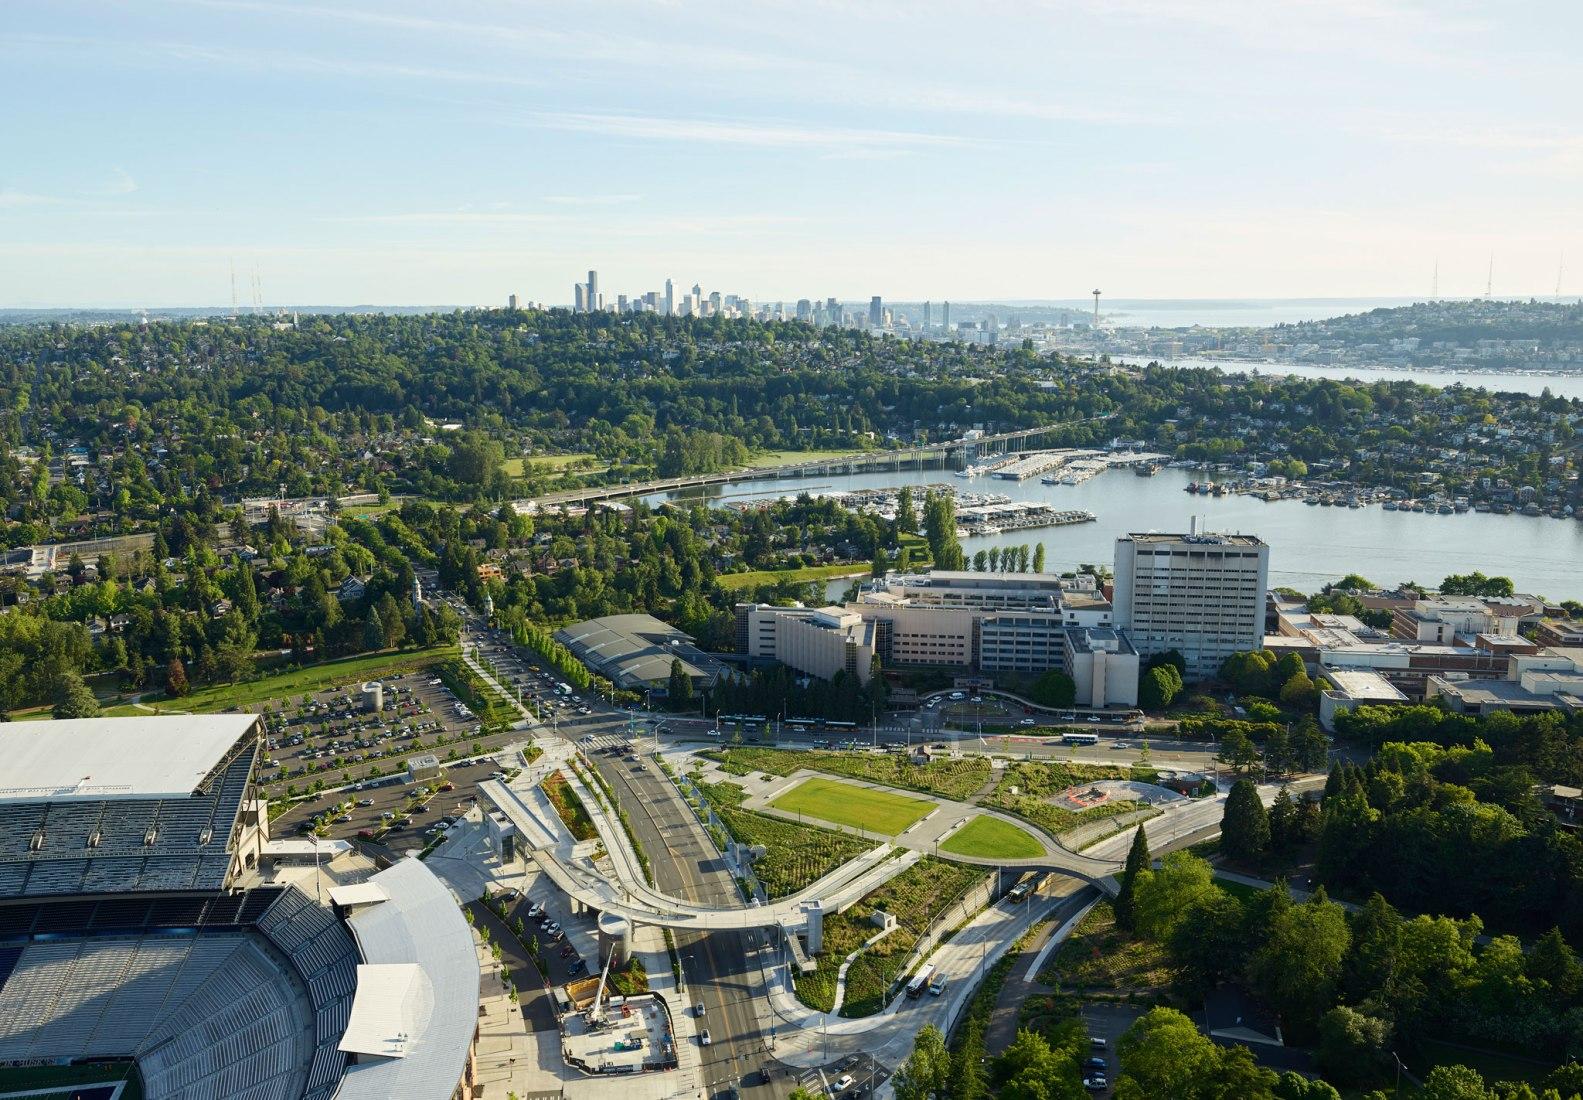 Aerial view. Sound Transit University of Washington Station by LMN Architects. Photography by KevinScott